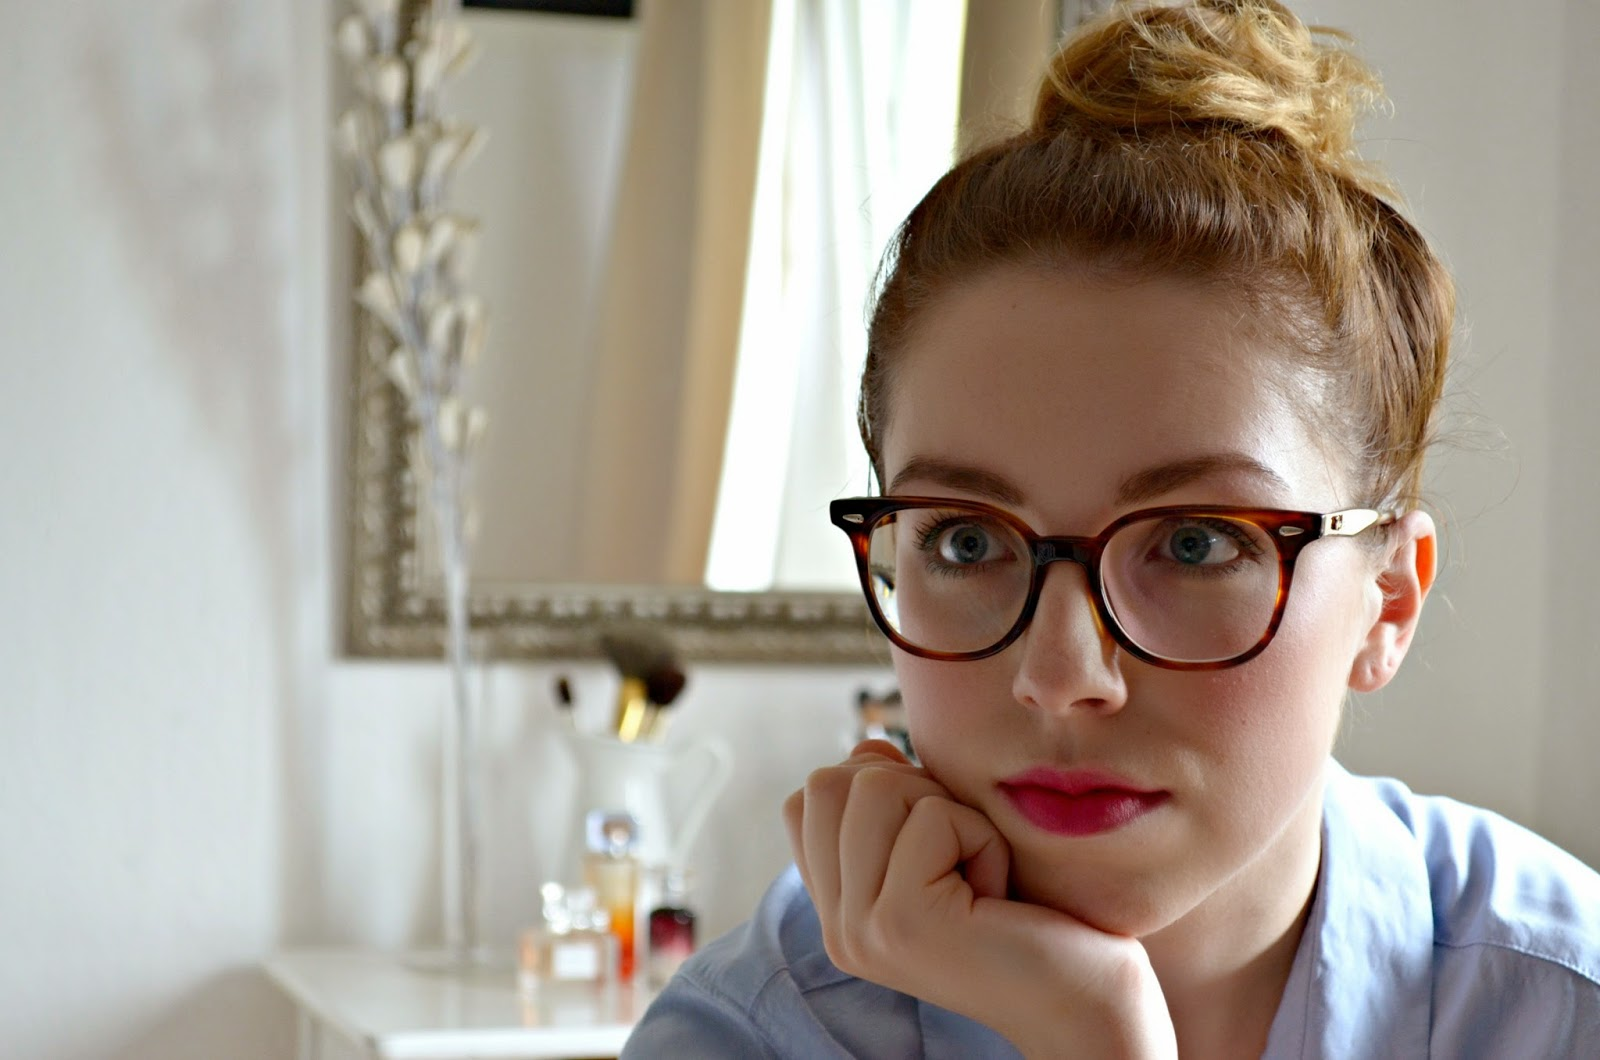 tante schnarri neue brille meine makeuptips f r. Black Bedroom Furniture Sets. Home Design Ideas